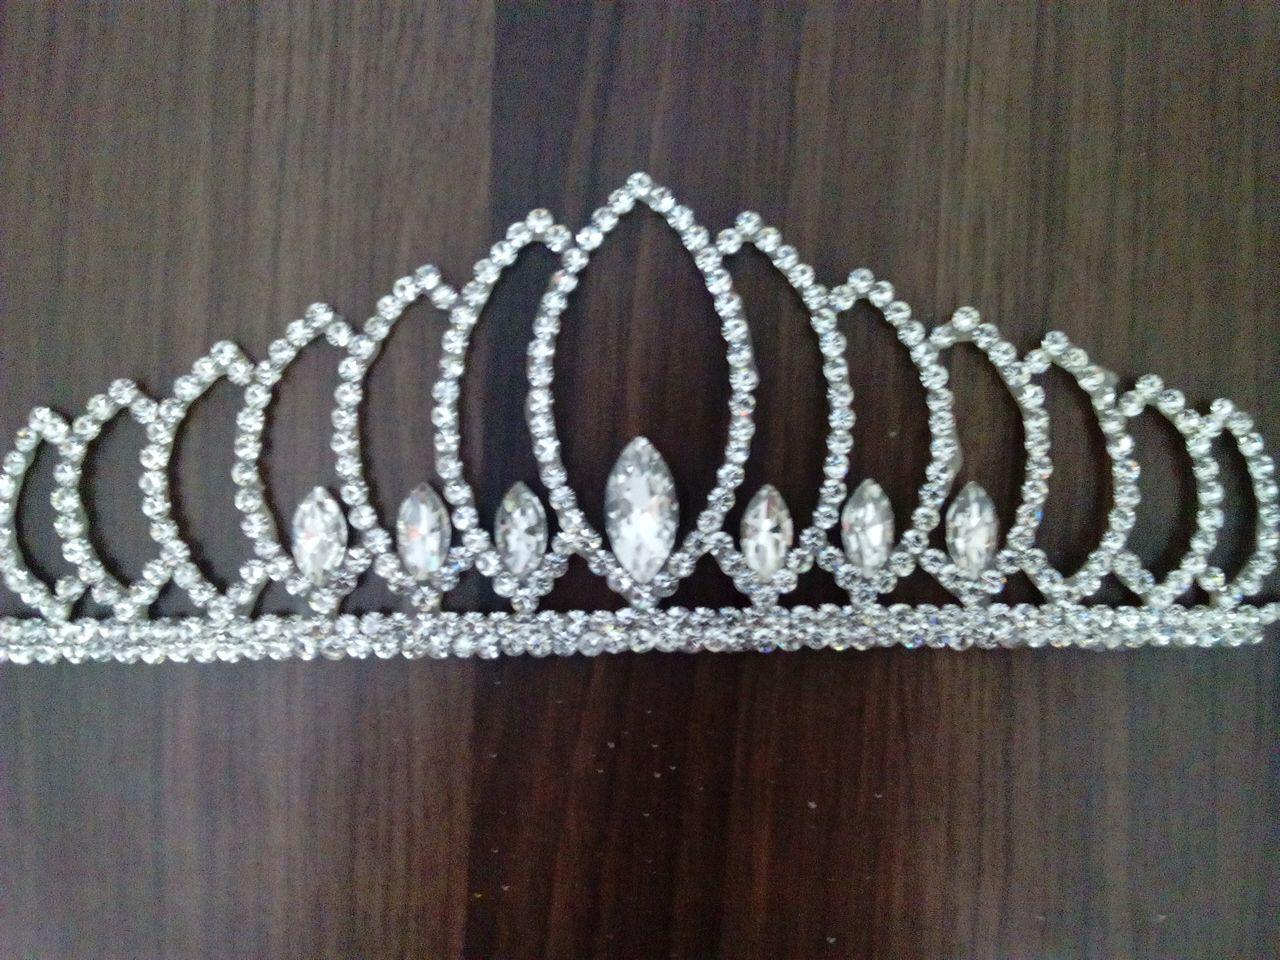 lemoo-Crown-Jelly-beautiful-7